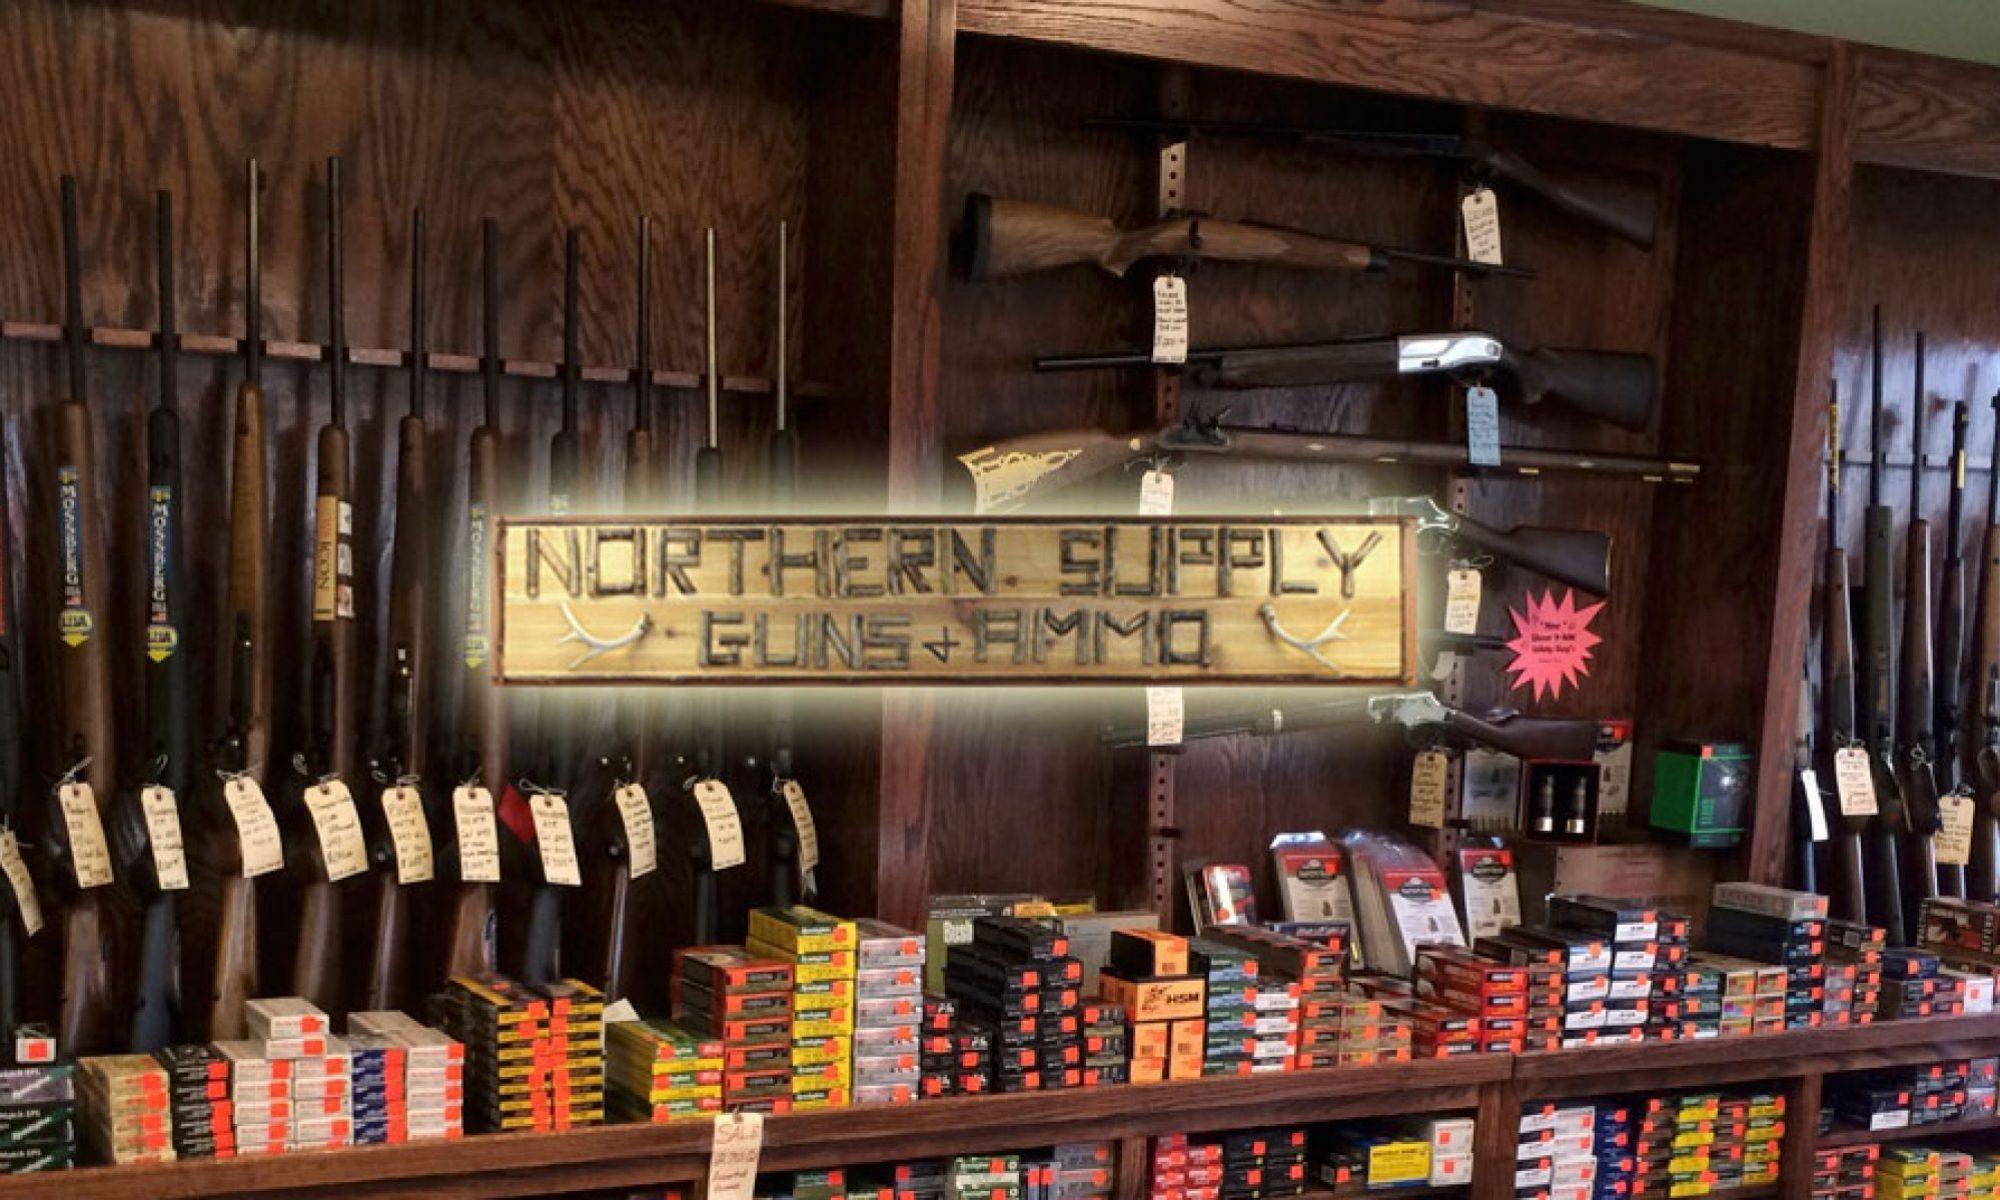 Northern Supply Guns and Ammo